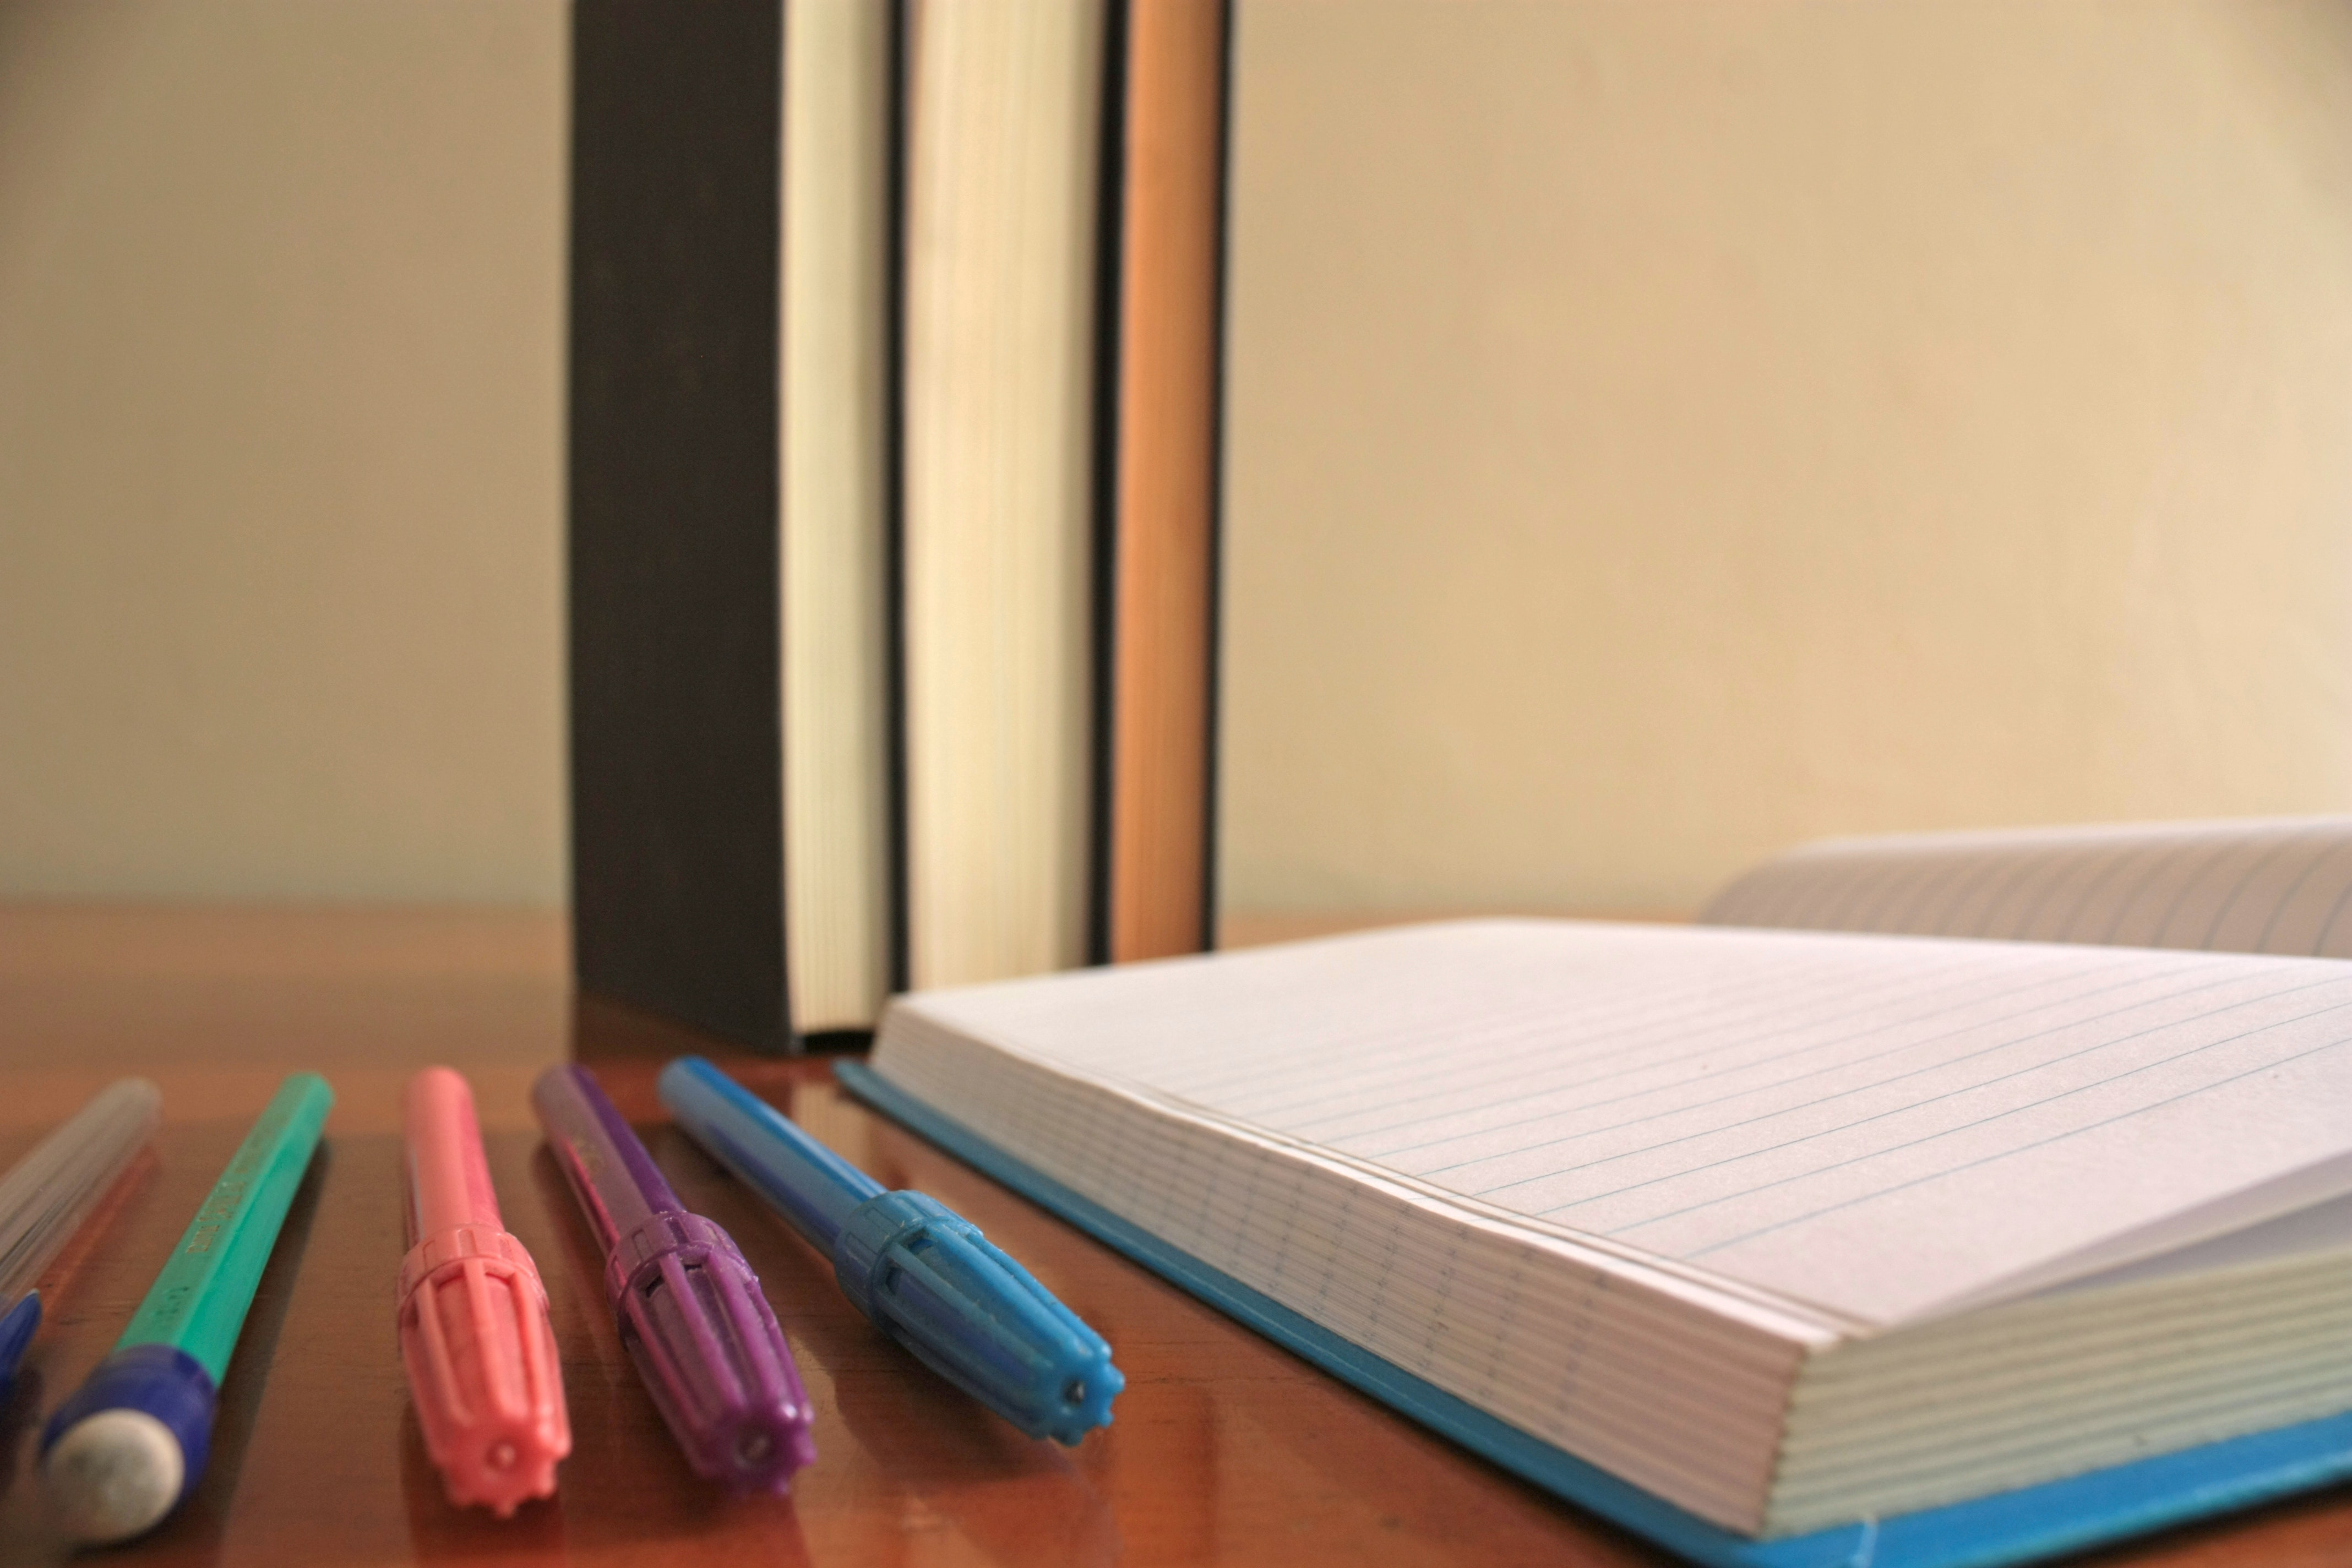 Five Assorted-color Pens Beside Blue Lined Paper